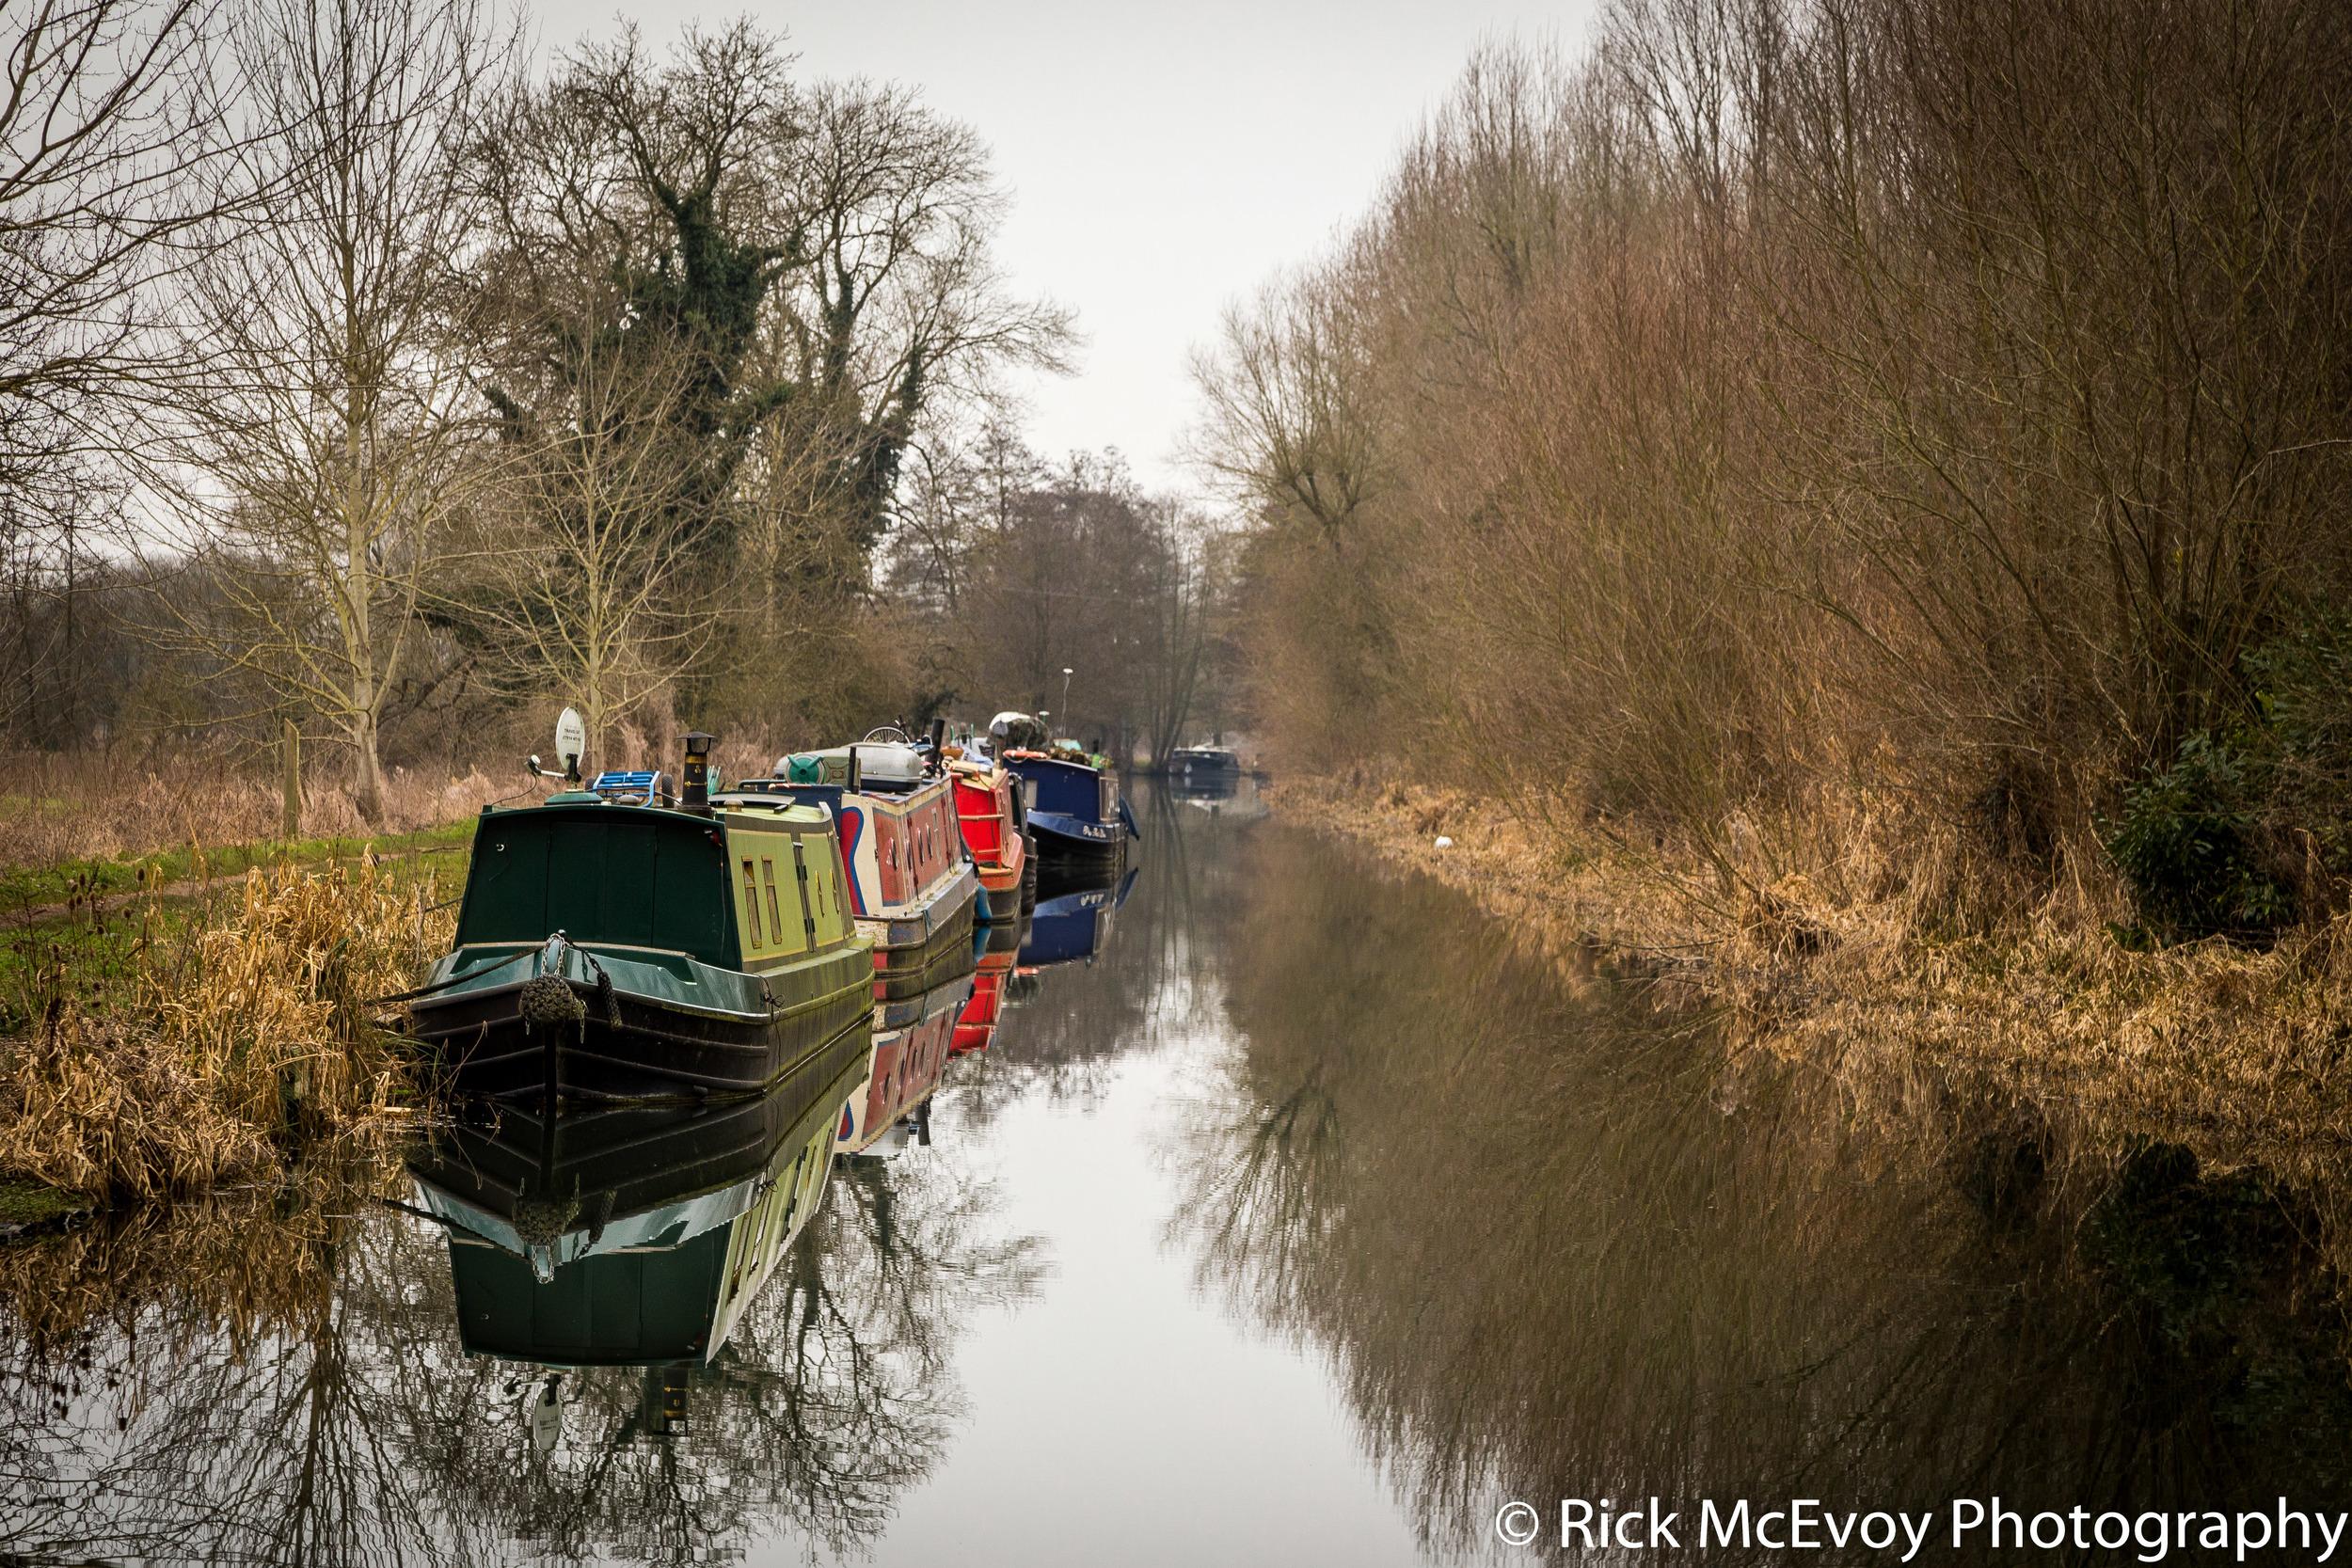 Canal, near Oxford, England